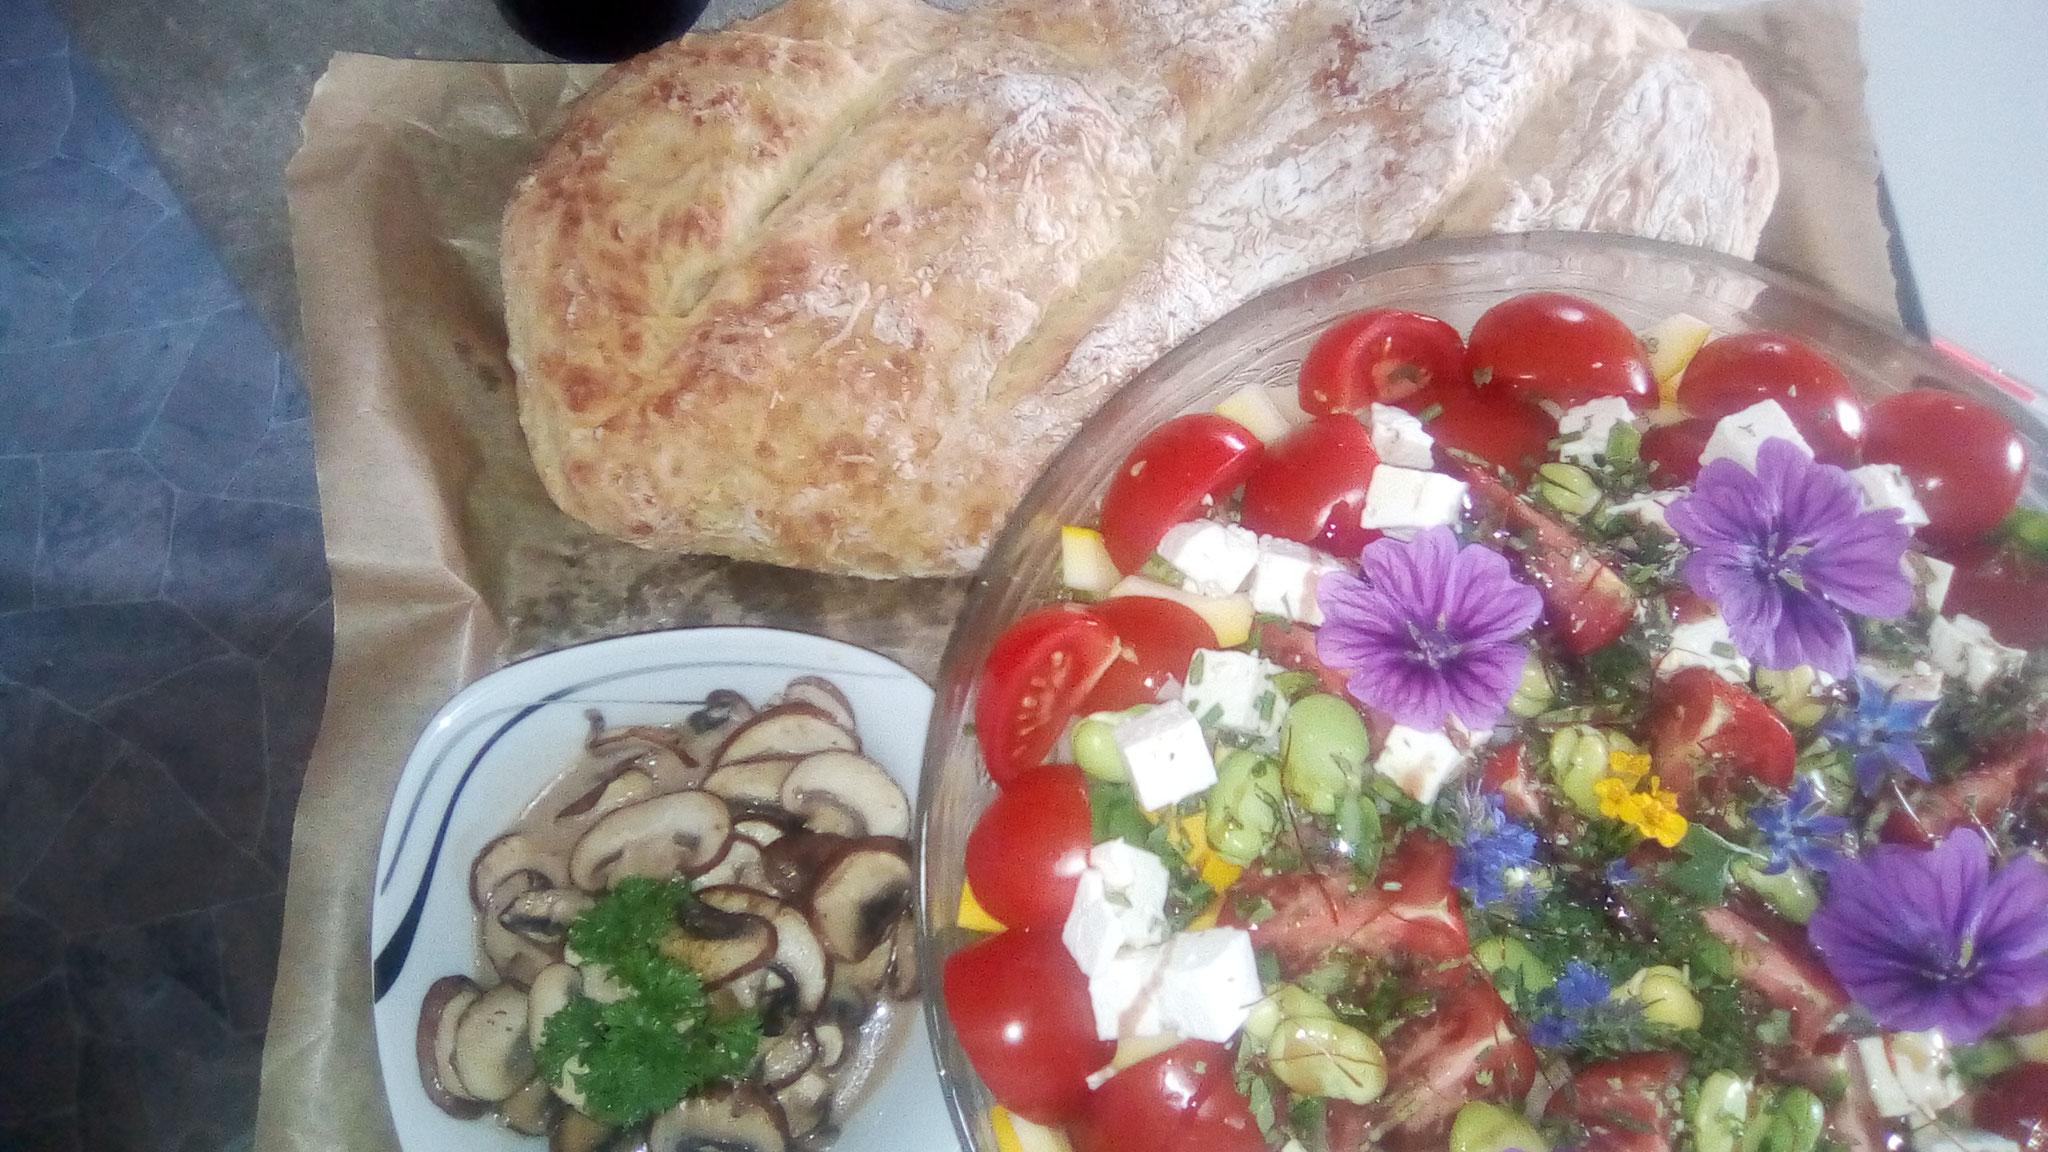 Bunter Salat mit Champignons und hausgebackenem Ciabatta